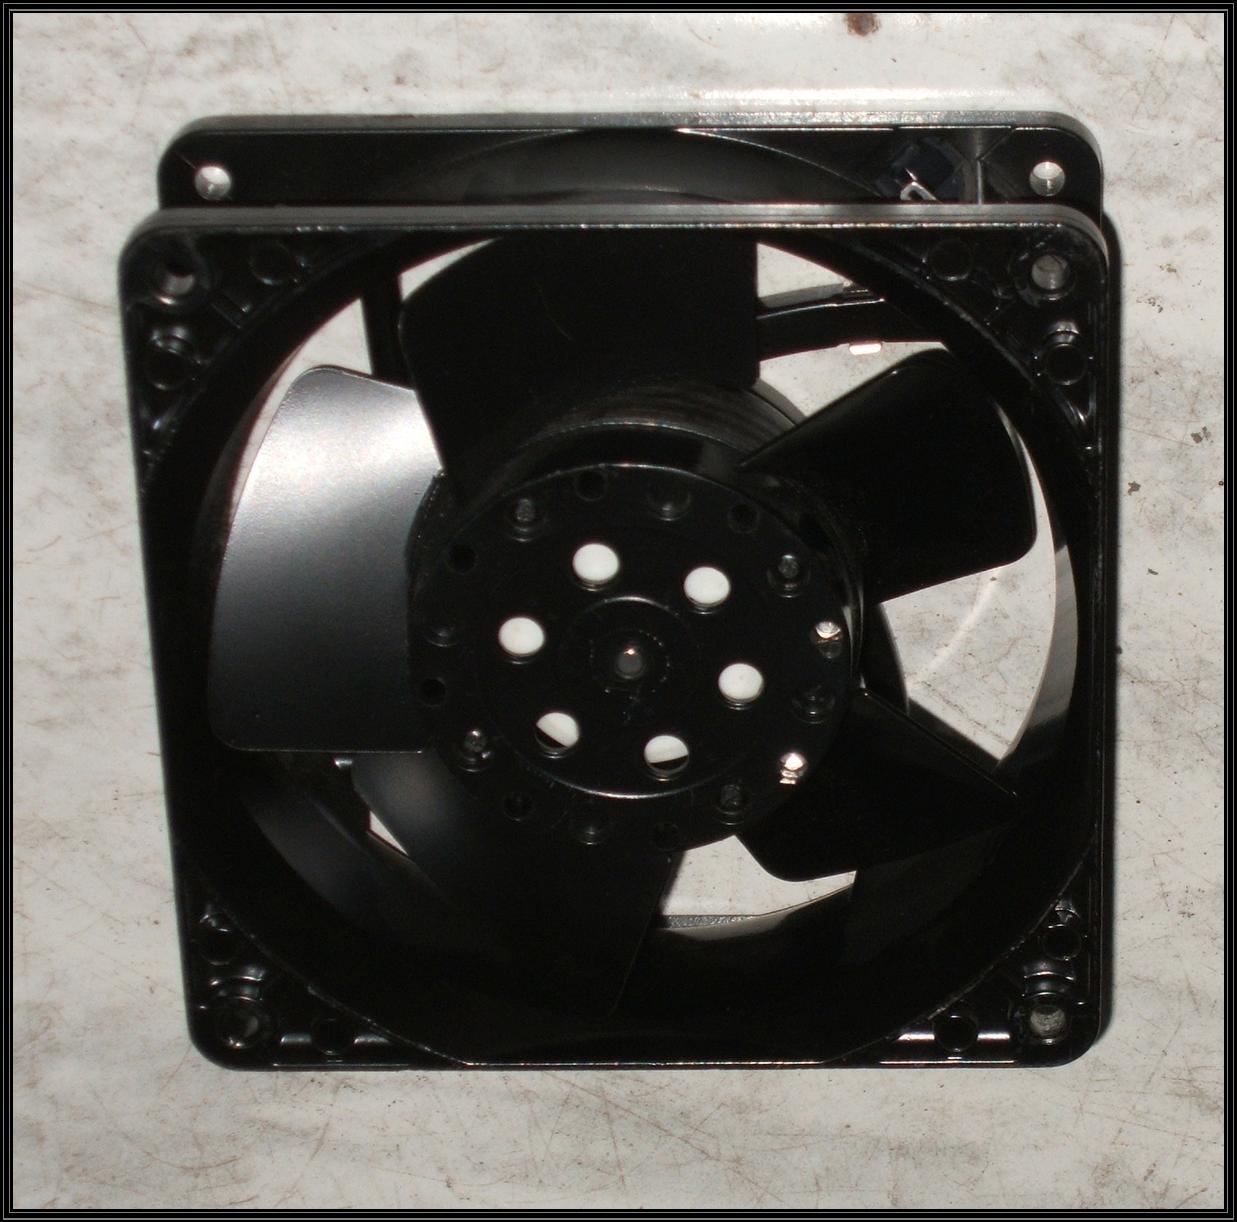 Chimeneas sierra ventiladores - Ventiladores silenciosos hogar ...